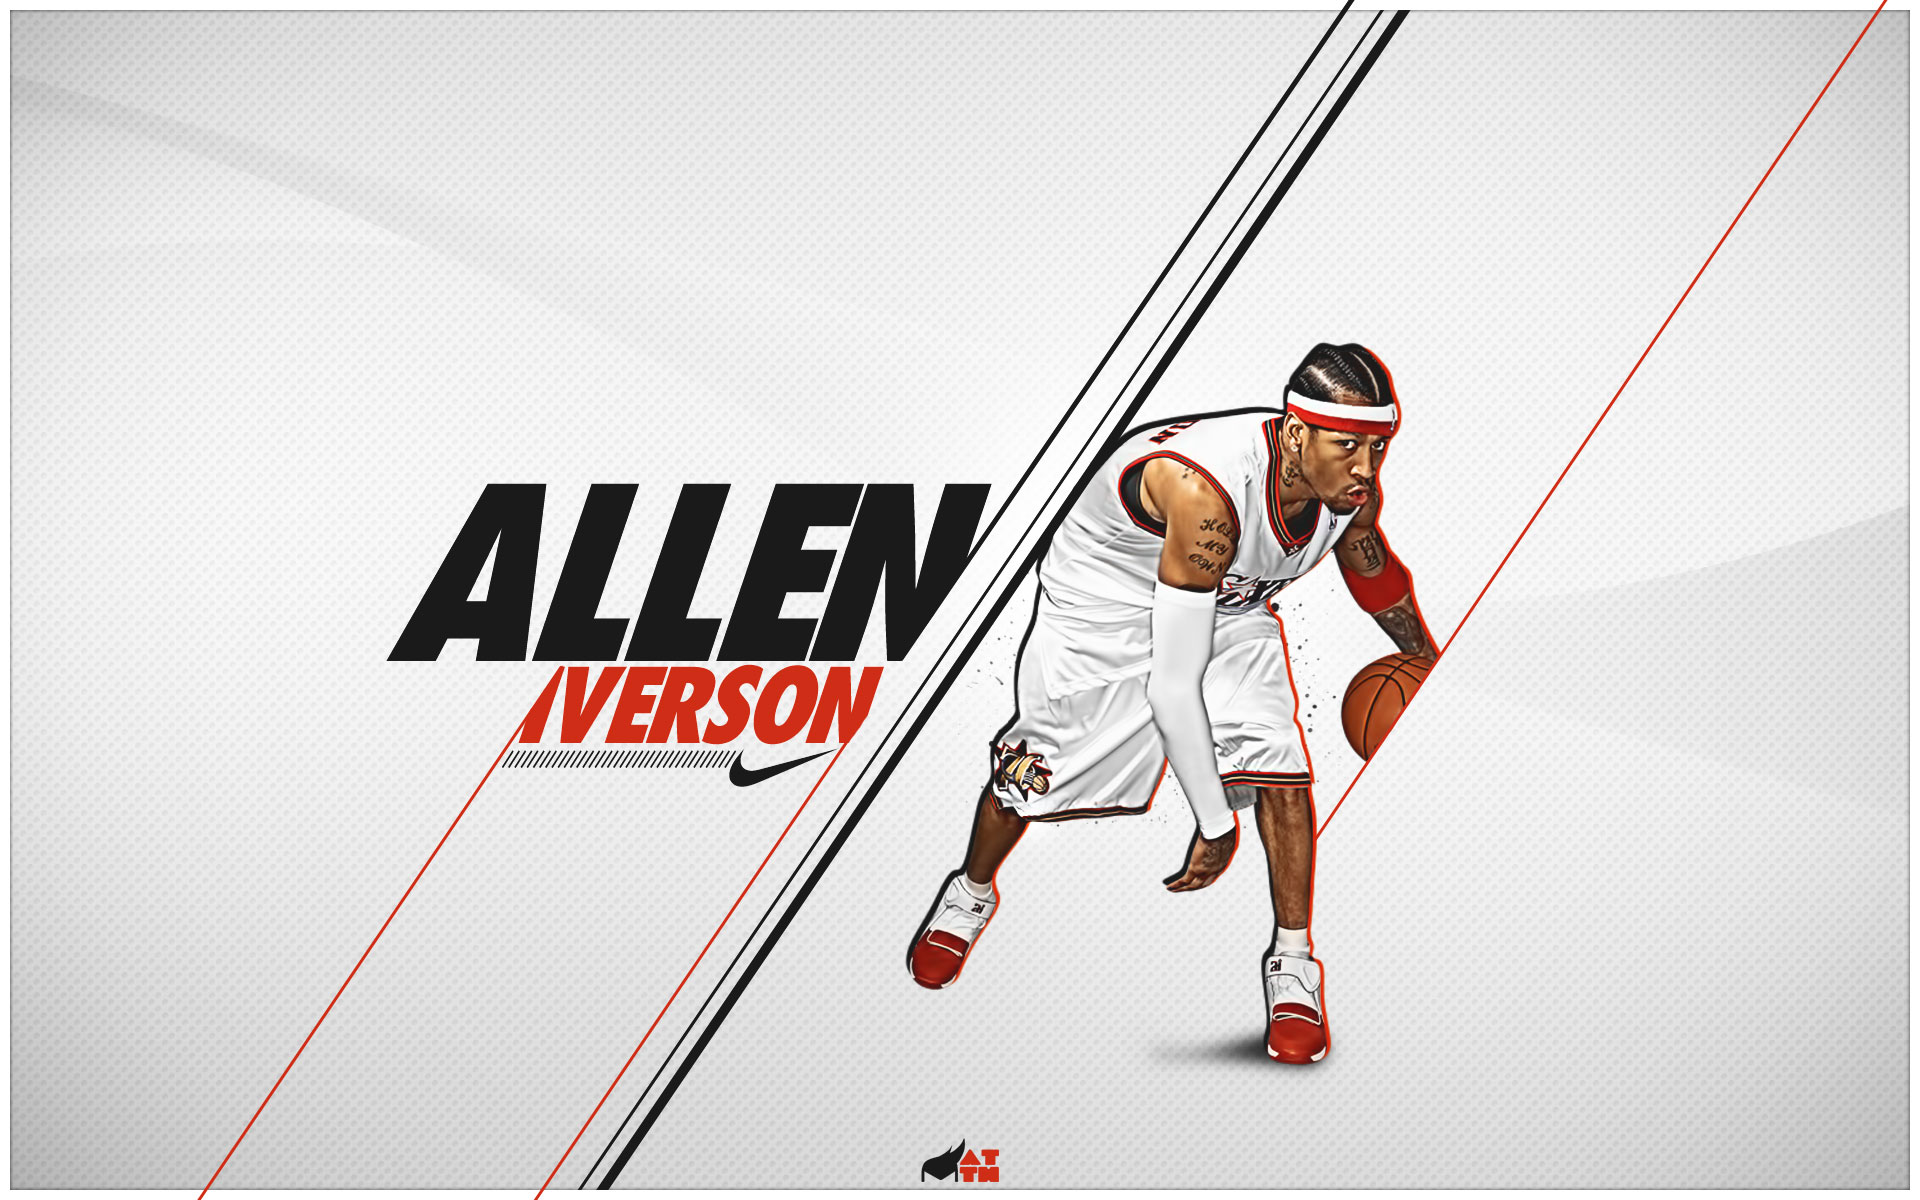 Lakers 3d Logo Wallpaper Allen Iverson Wallpapers Hd Pixelstalk Net